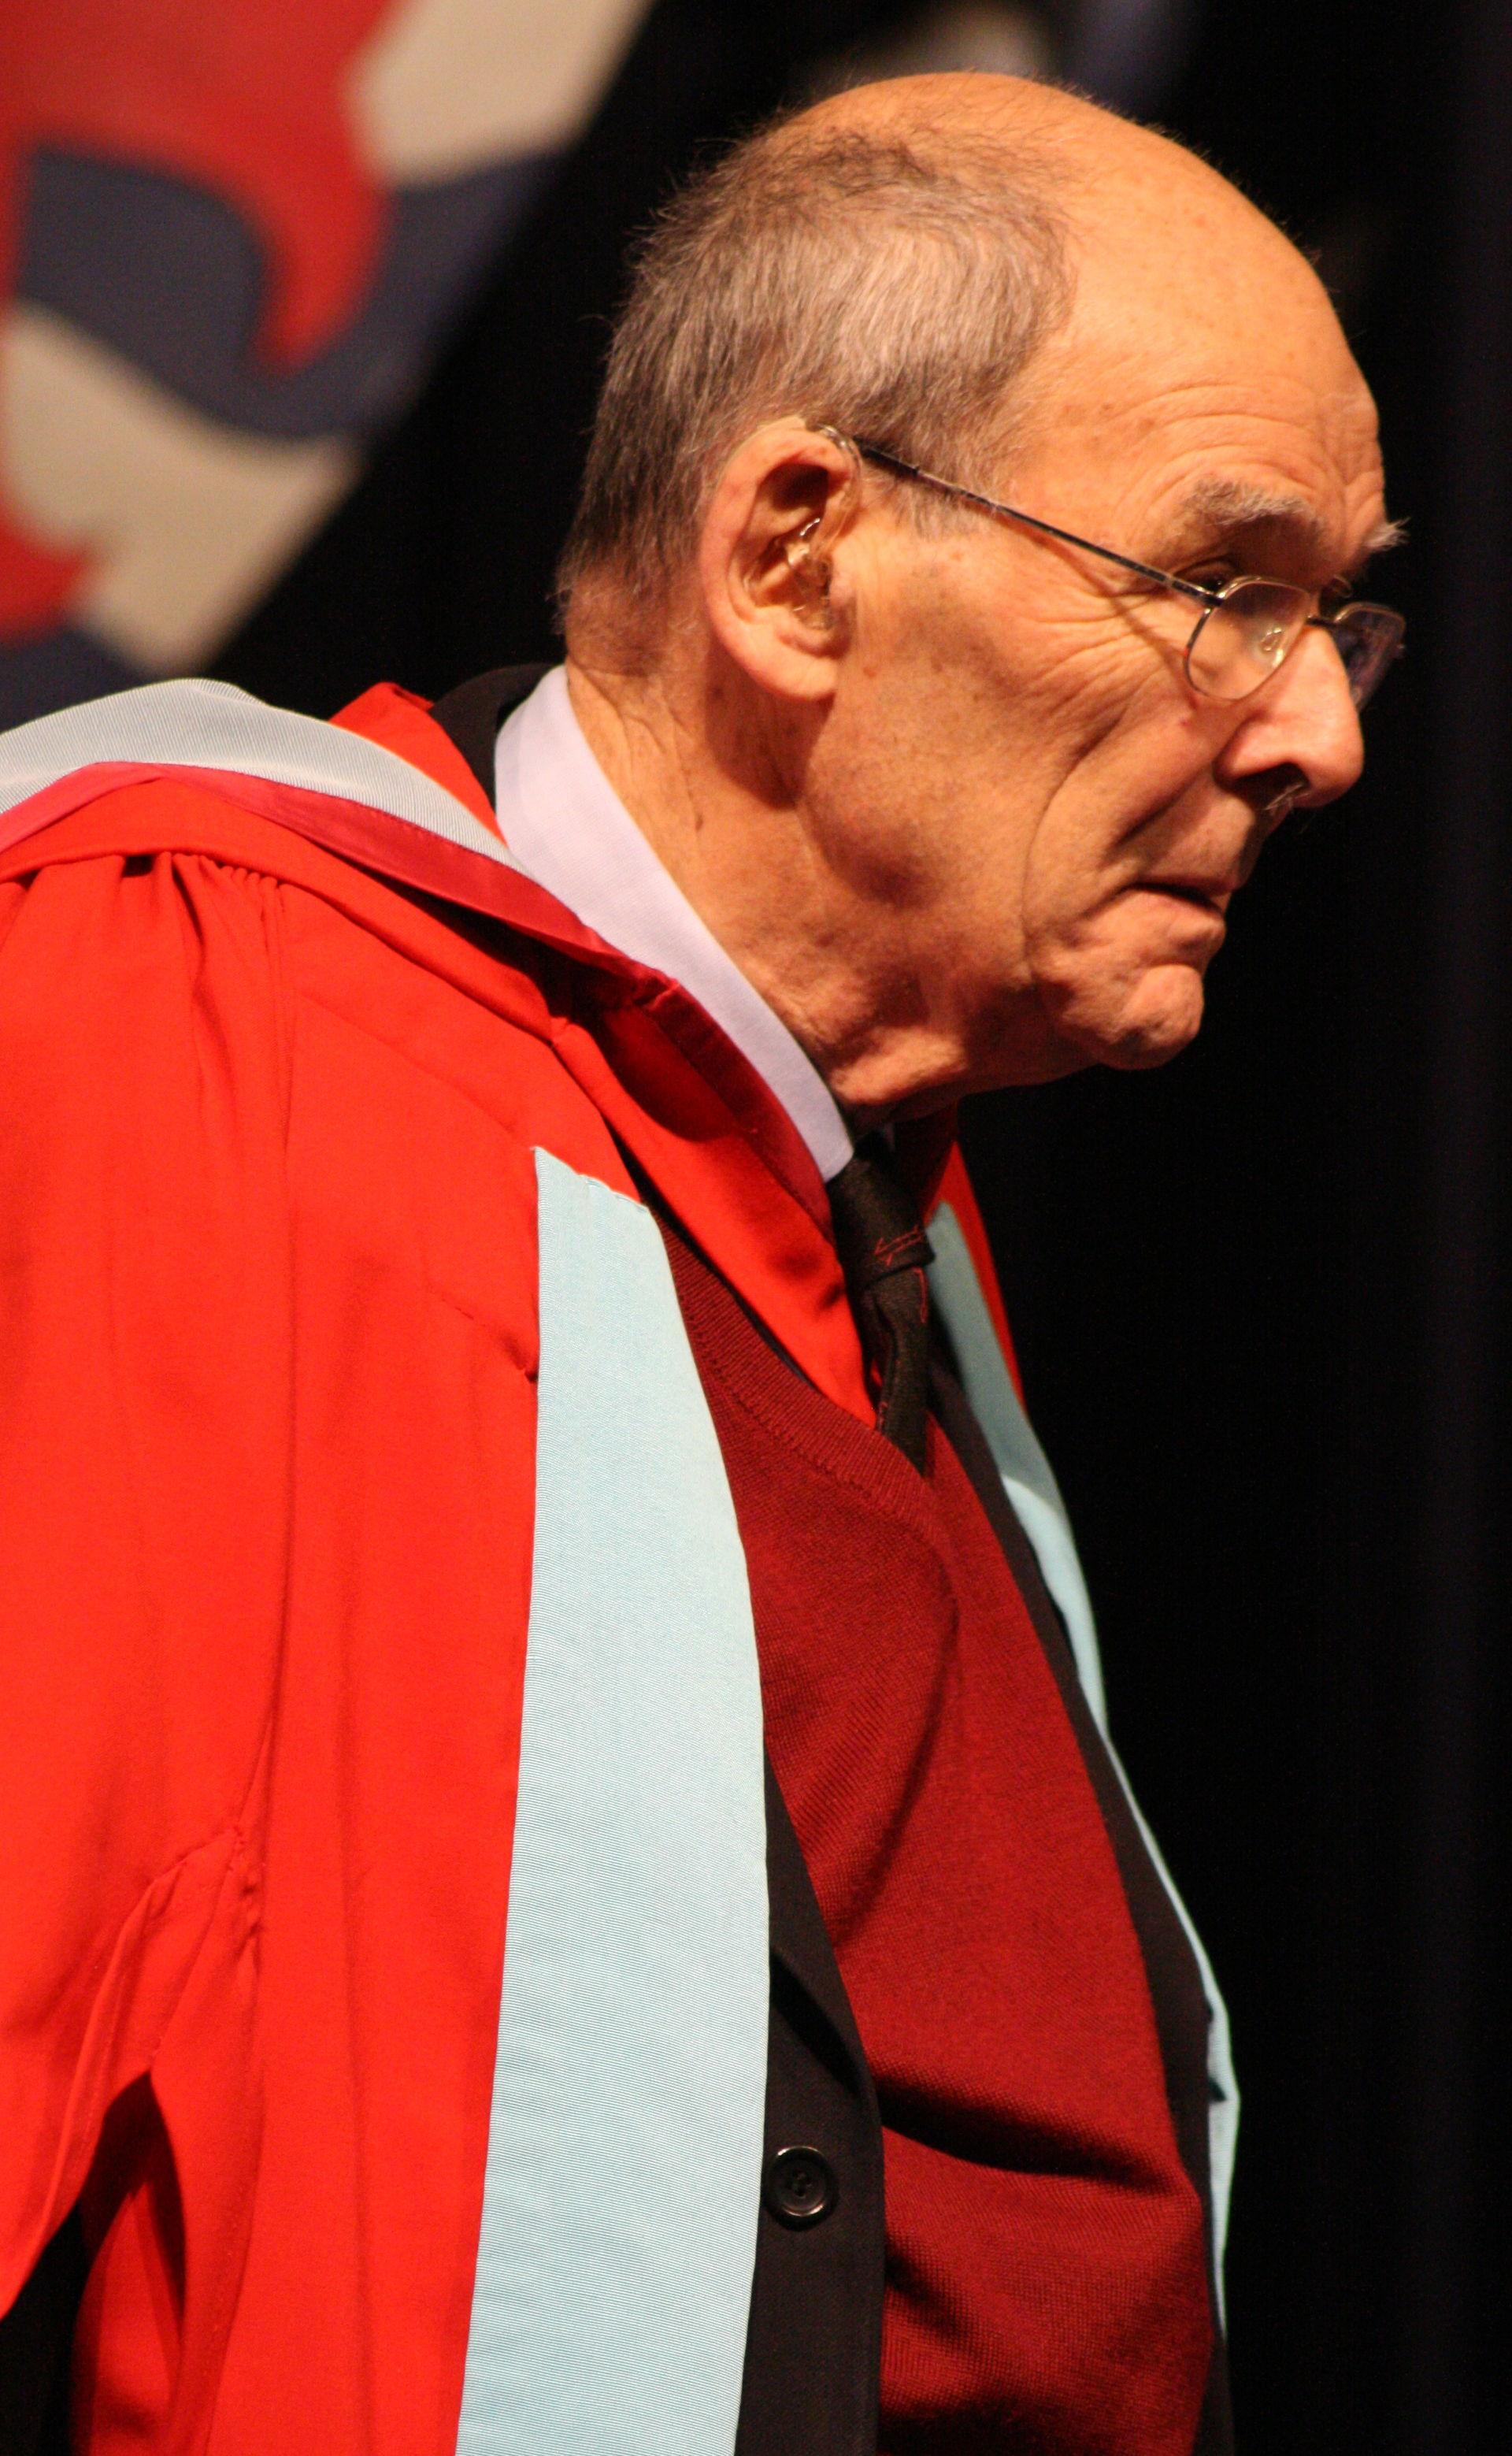 academic dress of the university of nottingham wikipedia